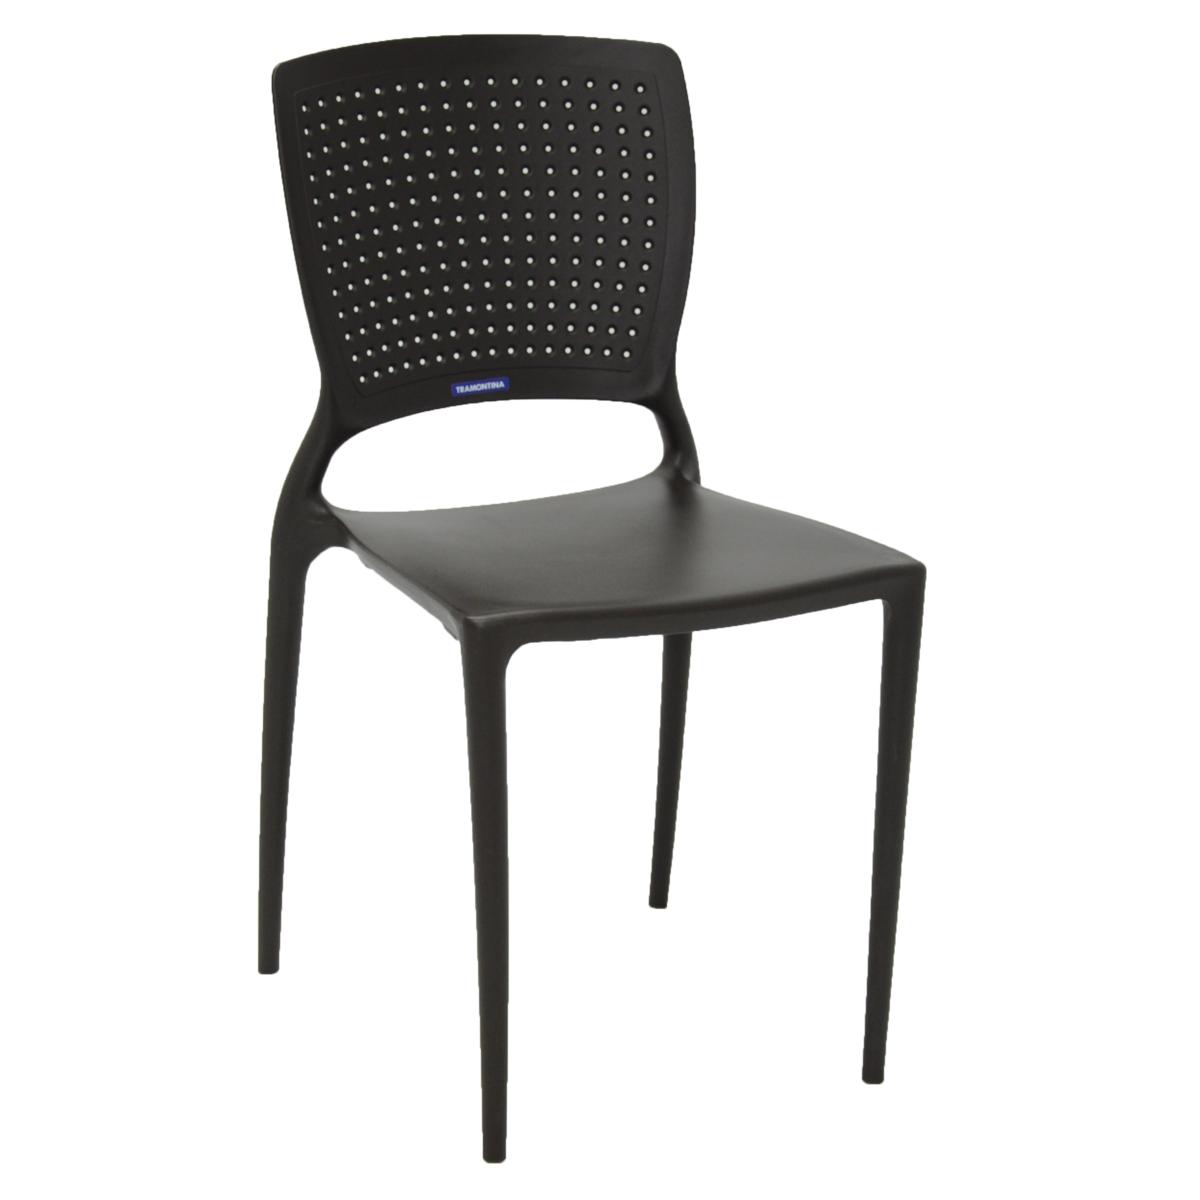 Cadeira Safira Polipropileno e Fibra de Vidro Marrom - Tramontina